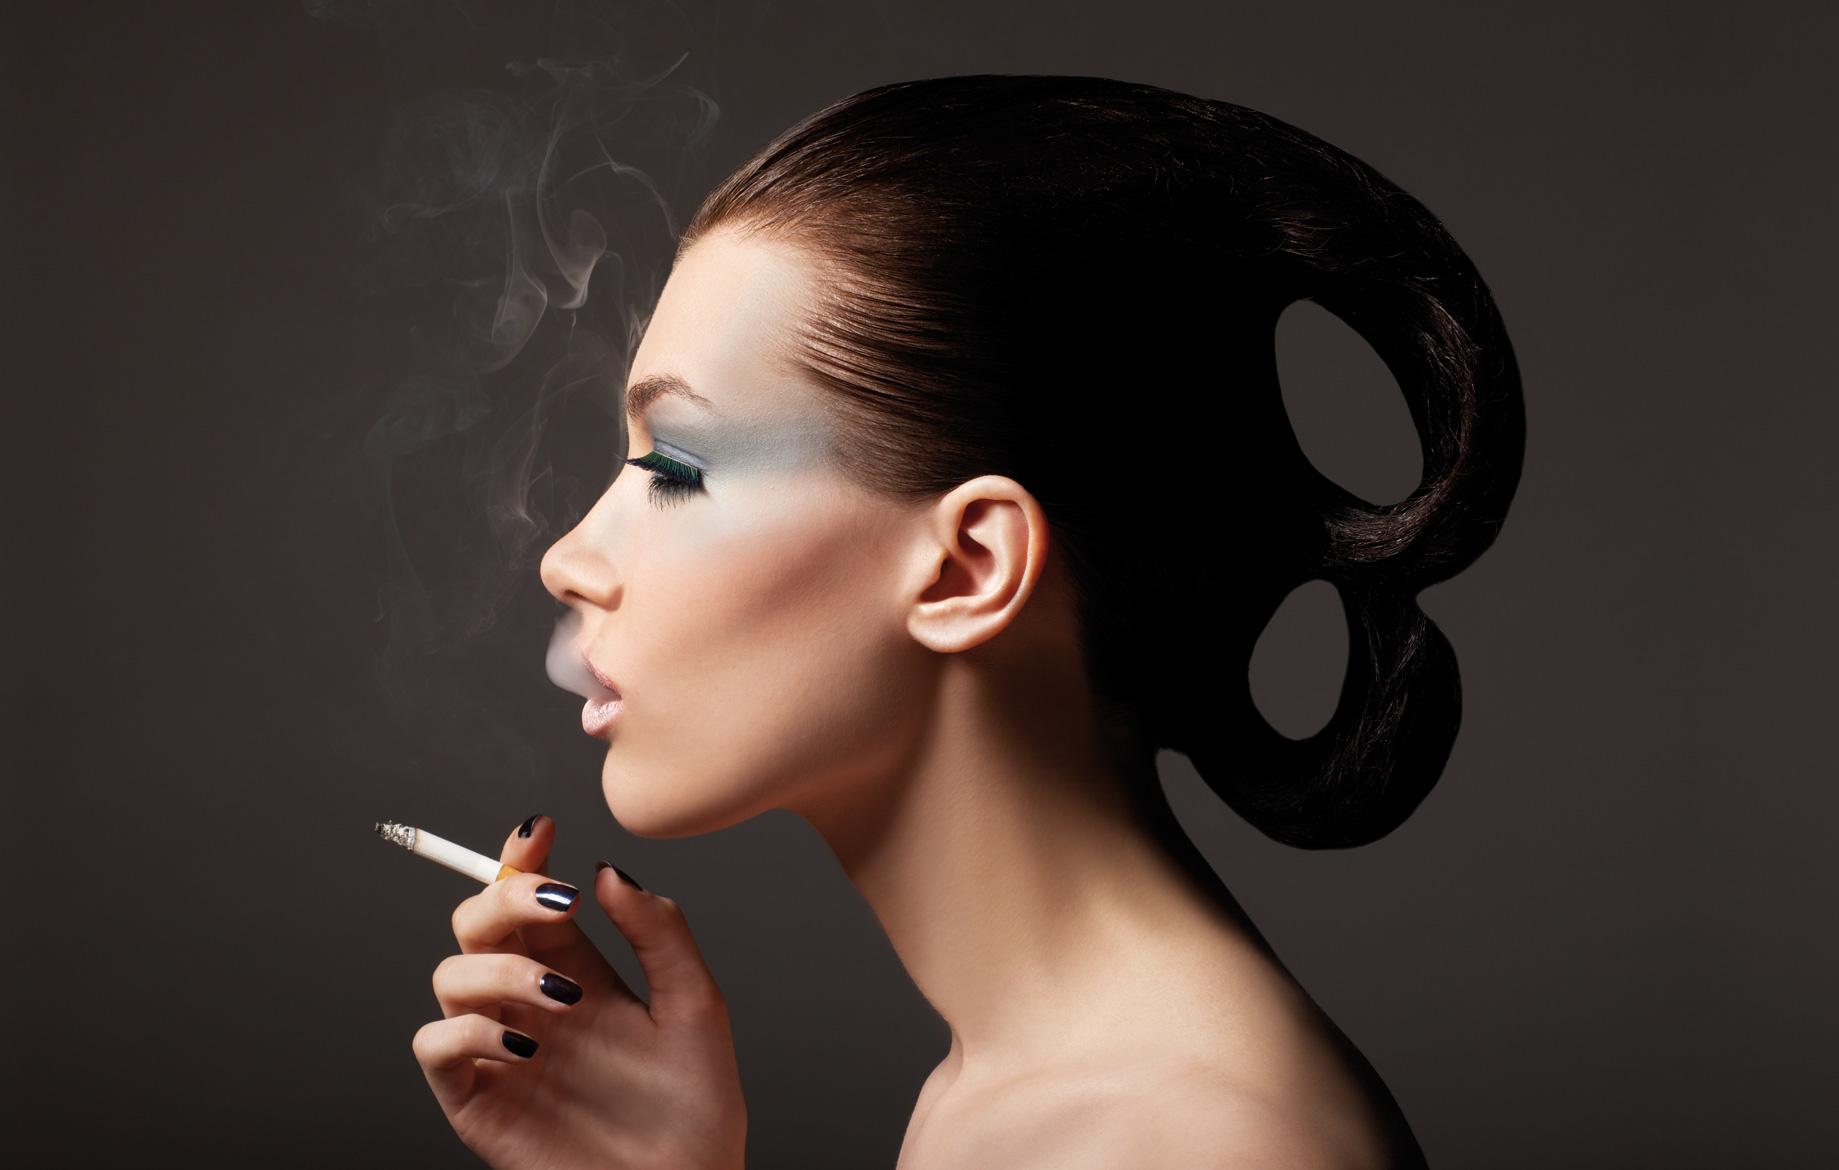 12-French-Vogue-22x14.jpg